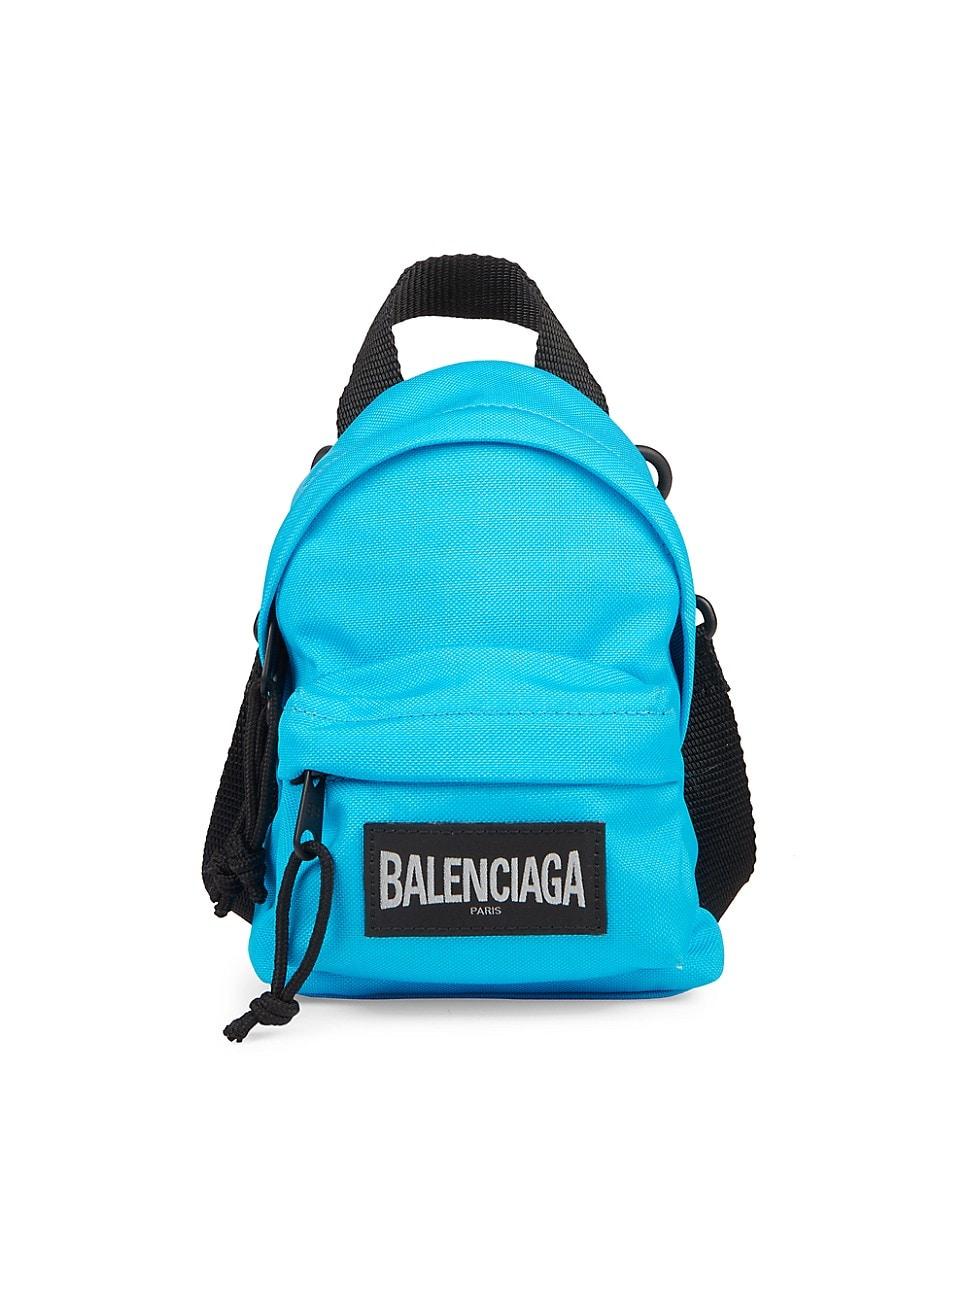 Balenciaga Leathers MEN'S OVERSIZED BACKPACK